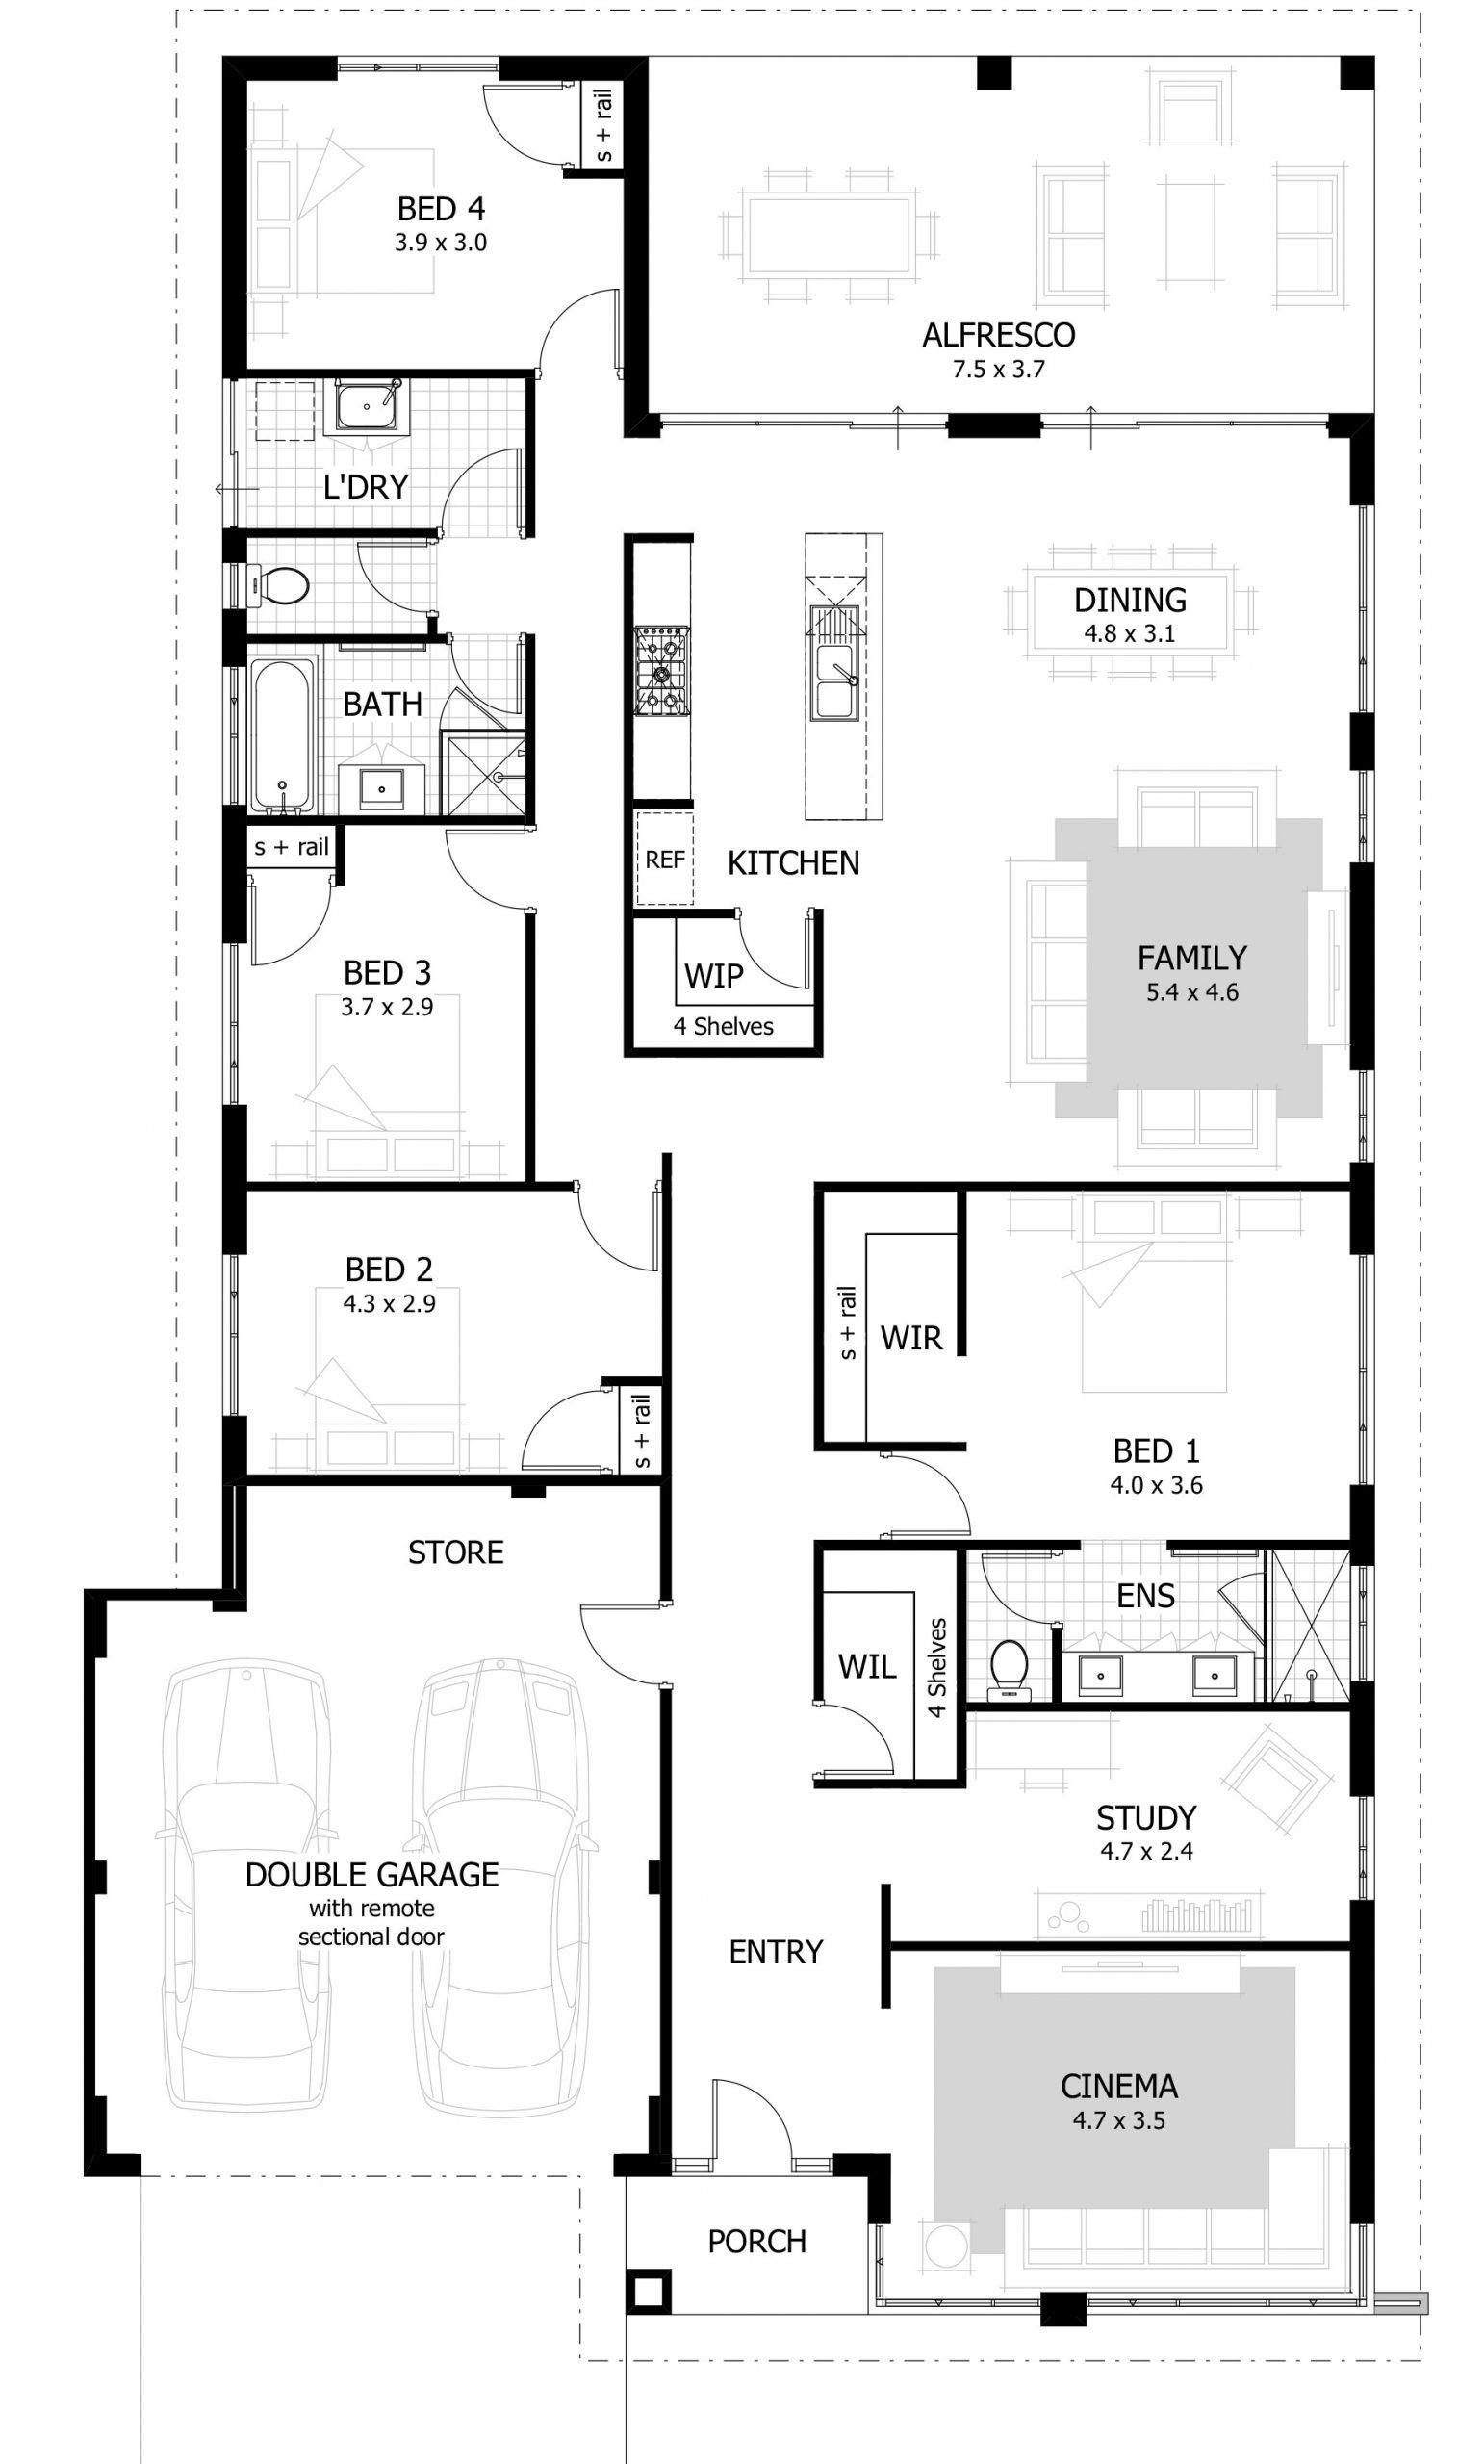 Modern House Plans Australia Bedroom Townhouse Designs House Plans Shoise Rent Master In 2020 House Plans Australia 4 Bedroom House Plans Bedroom House Plans